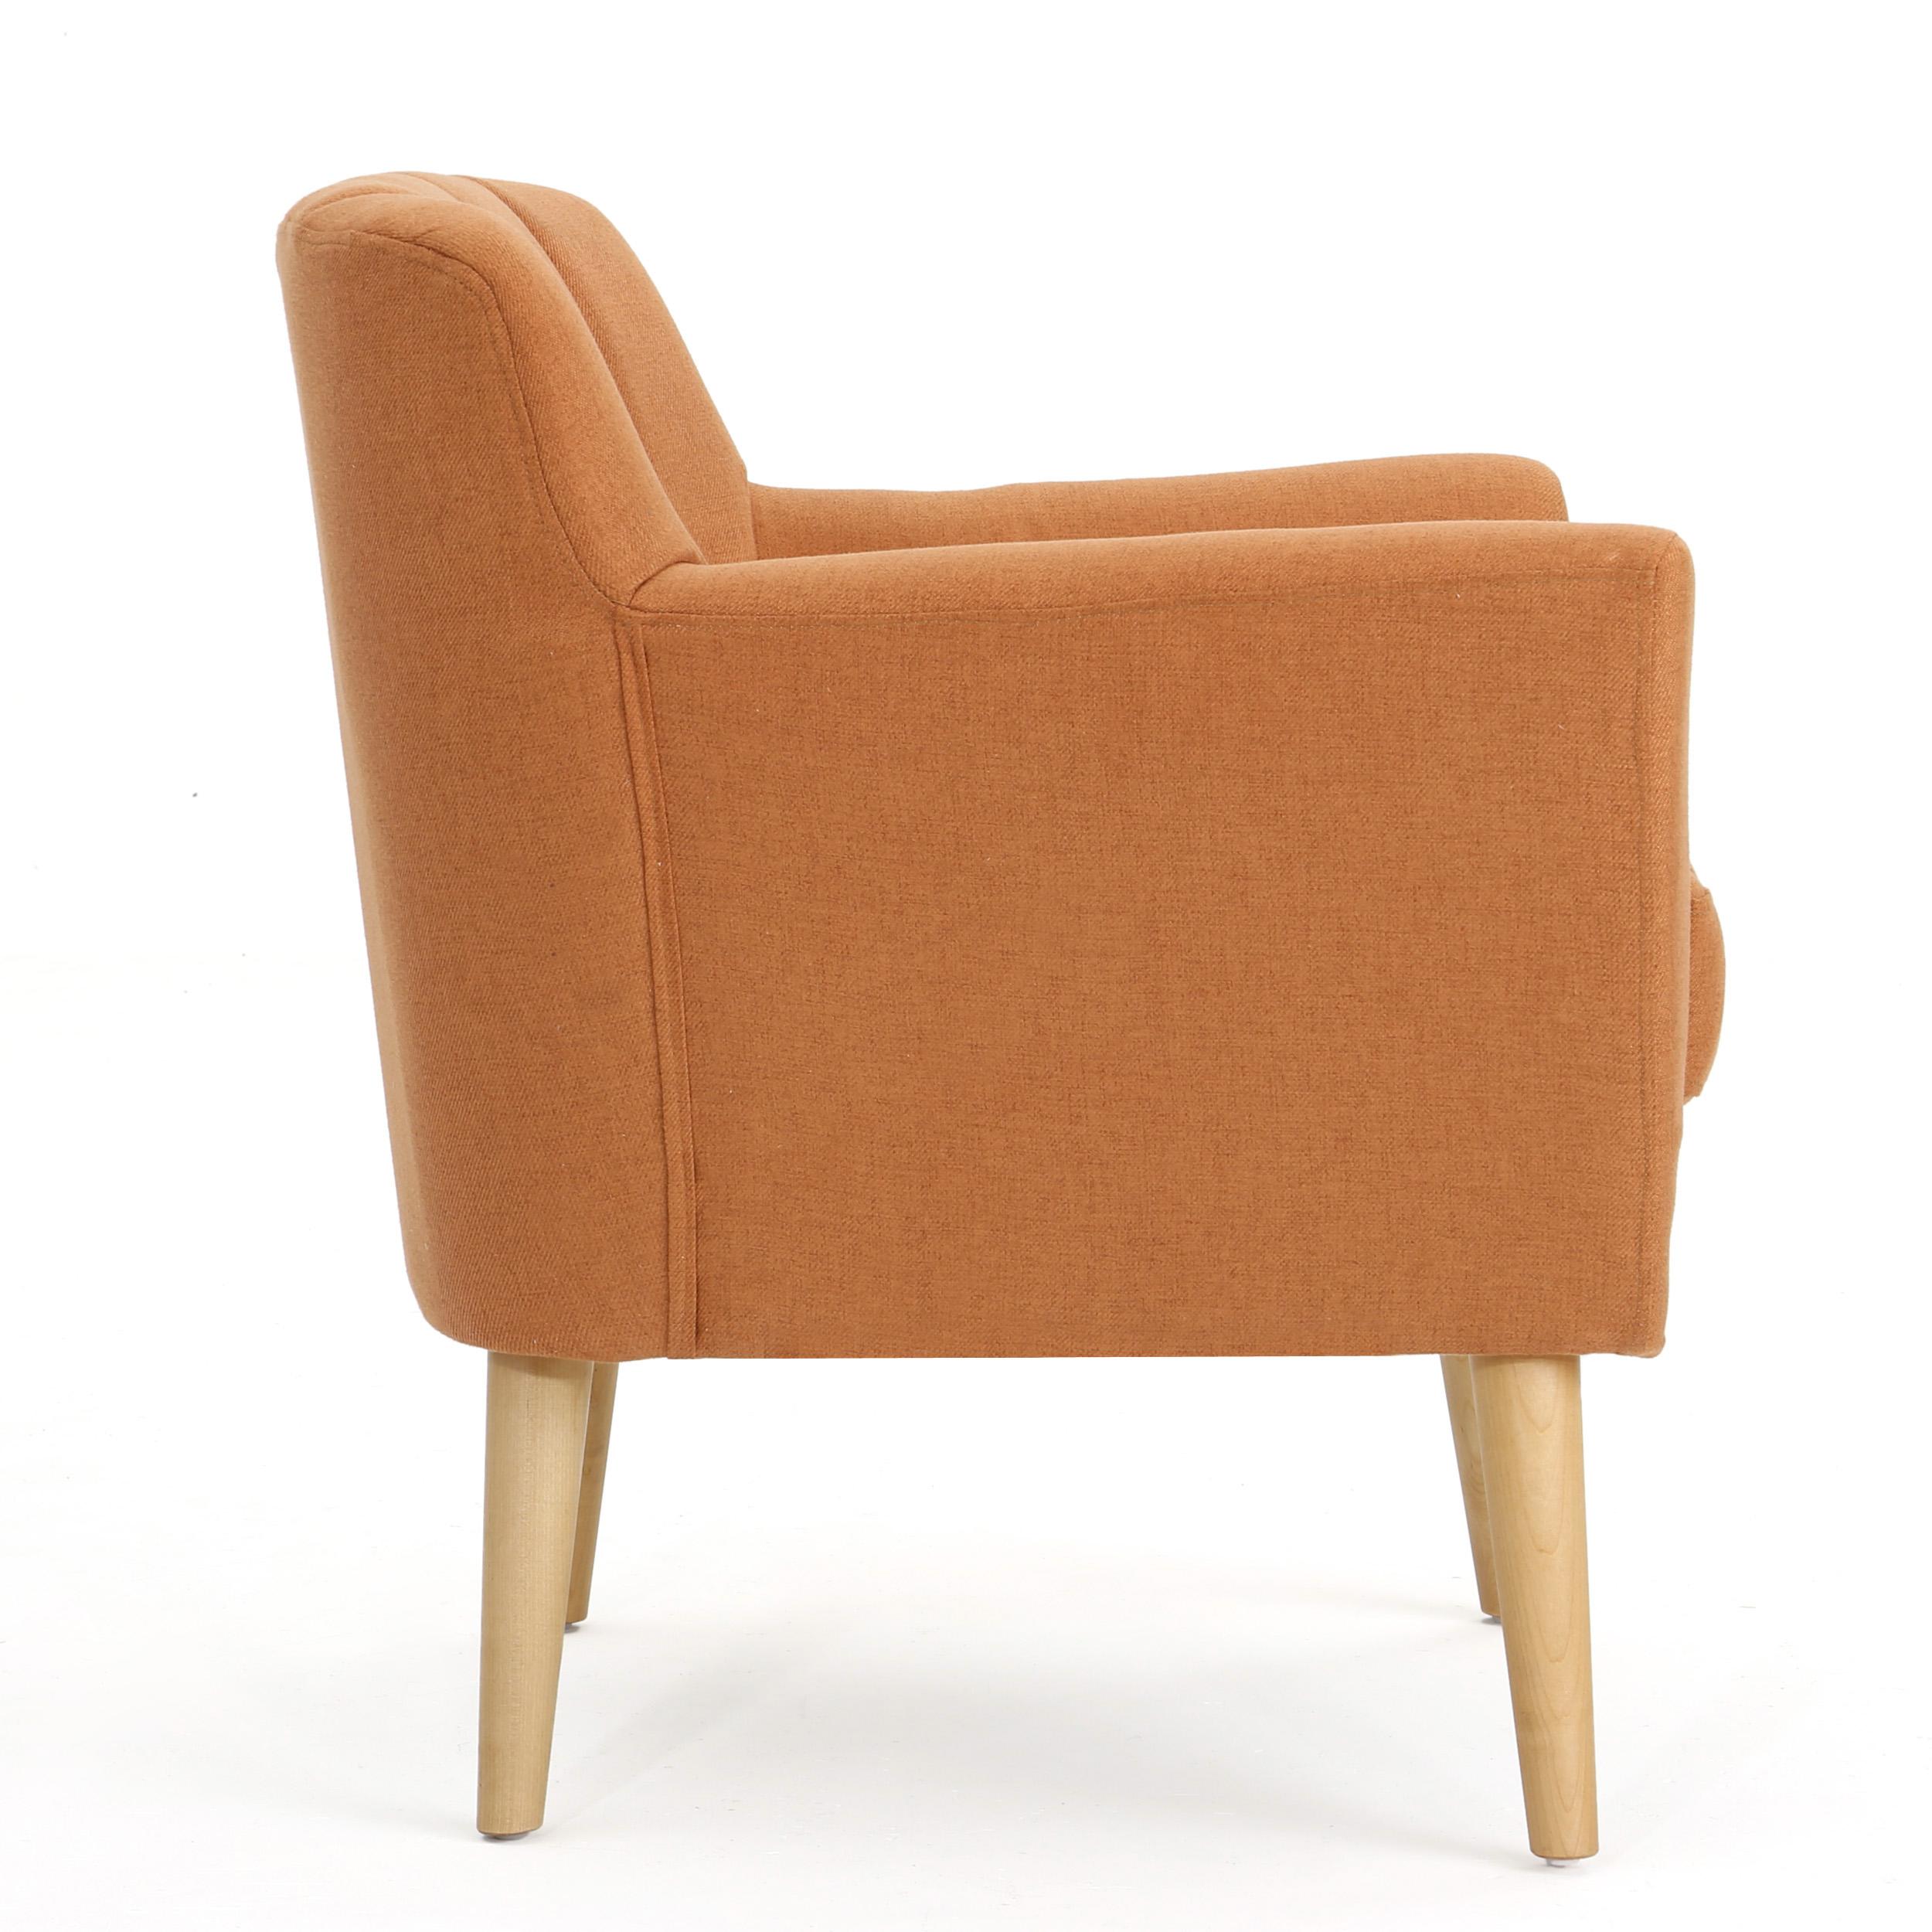 Wondrous Madelyn Mid Century Modern Fabric Club Chair Ebay Machost Co Dining Chair Design Ideas Machostcouk